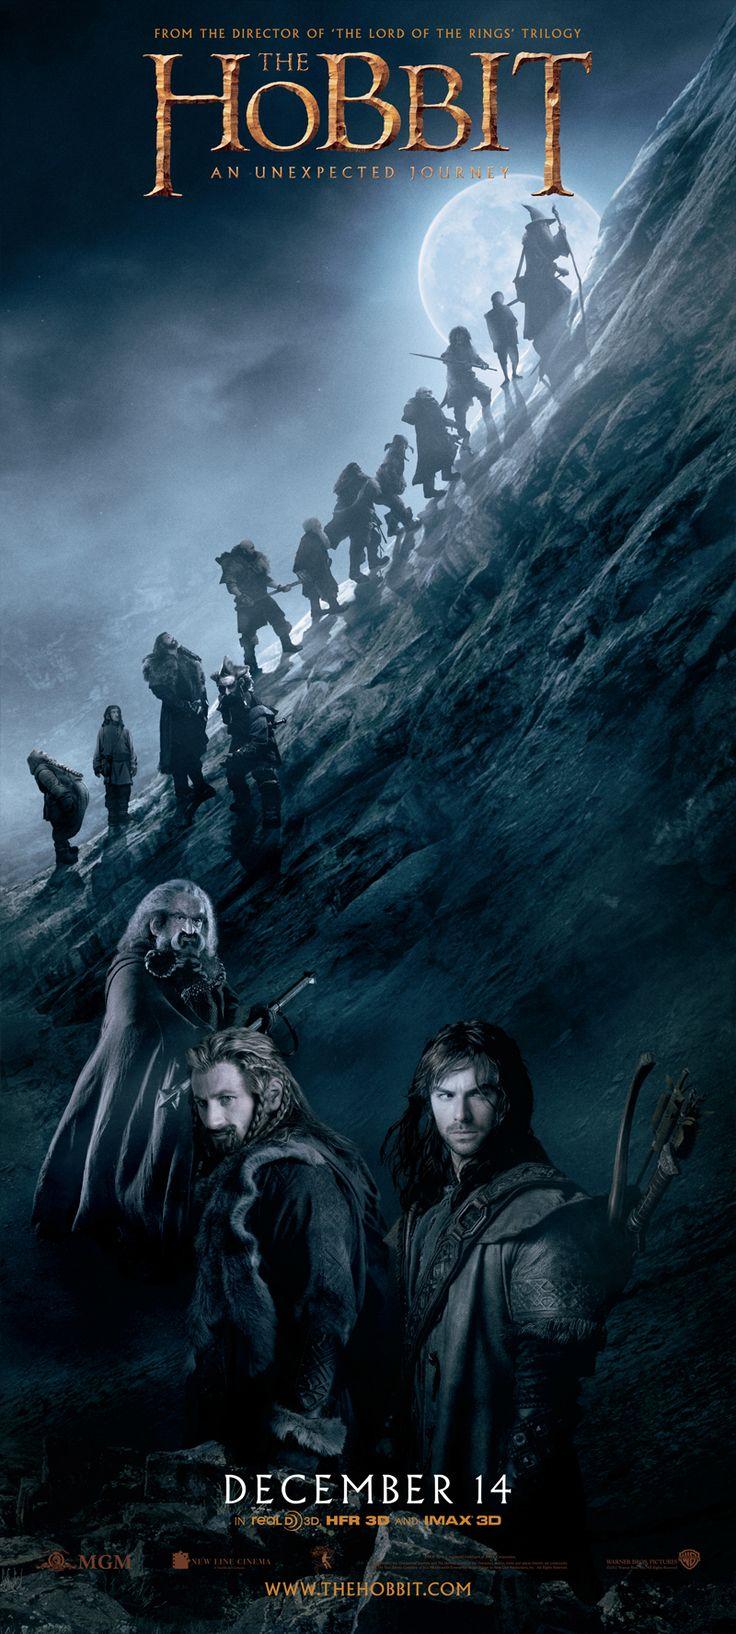 The Hobbit: An Unexpected Journey | Vertical poster teaser Kili and Fili #dwarves